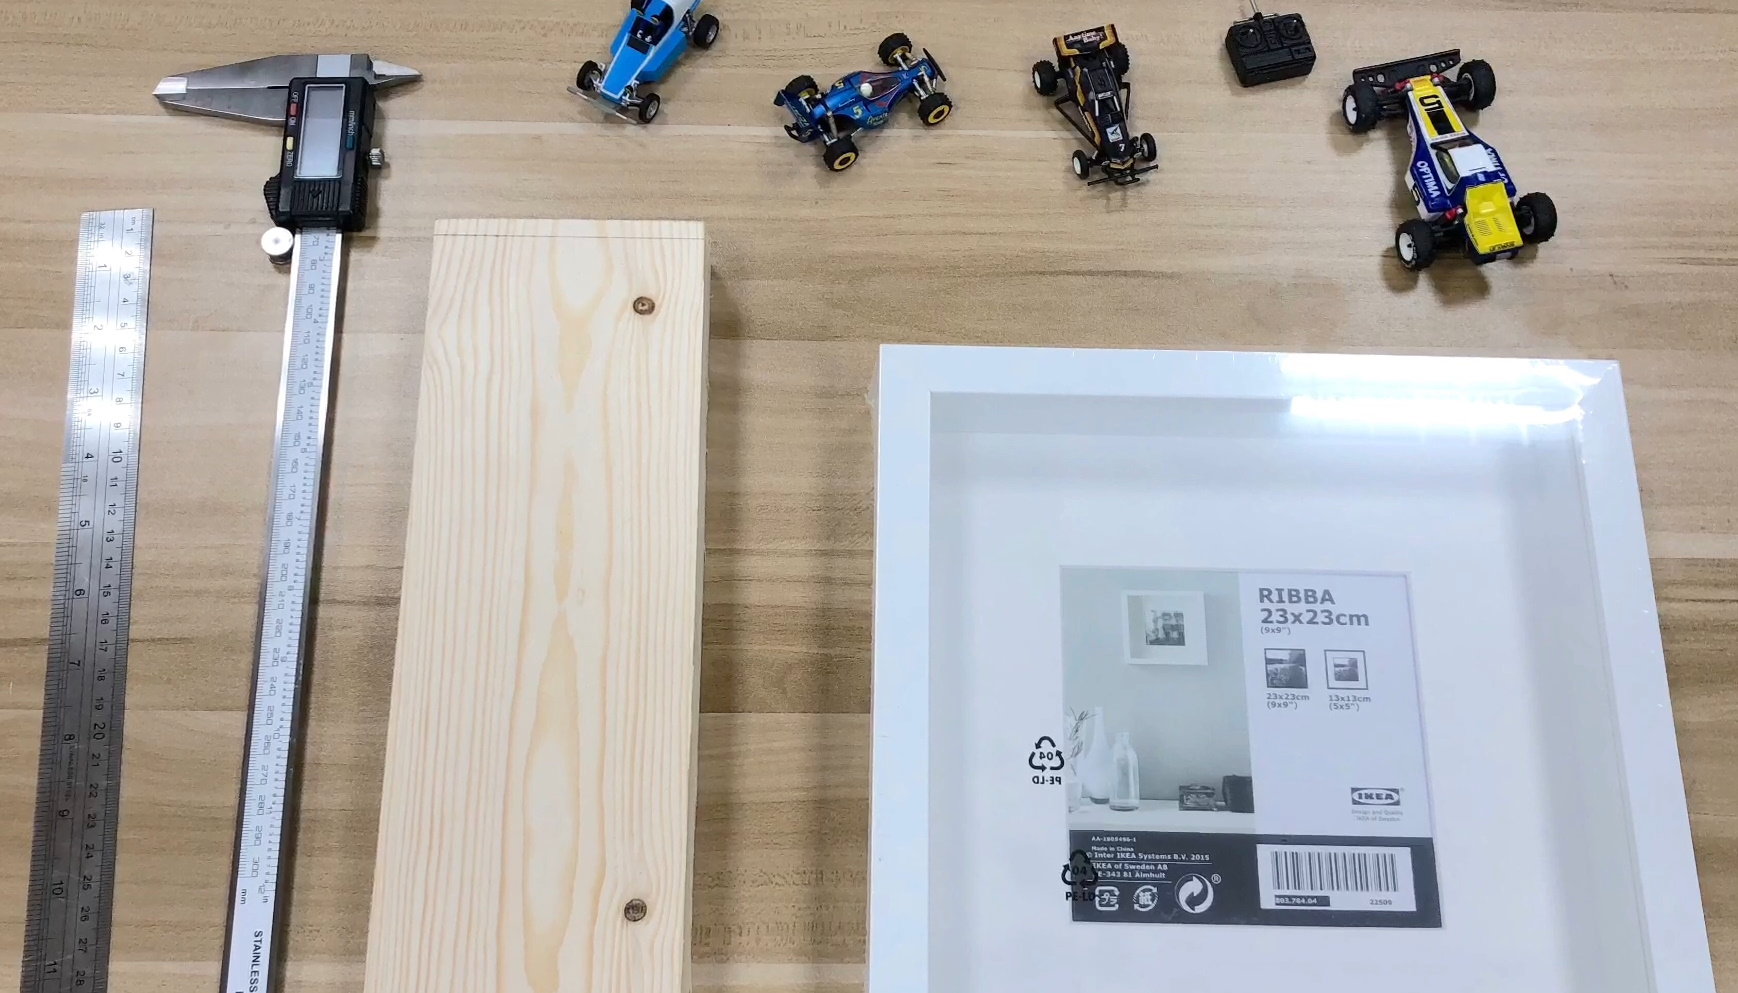 FORMART小型真空成型機(桌上型真空吸塑機)製作展示相框